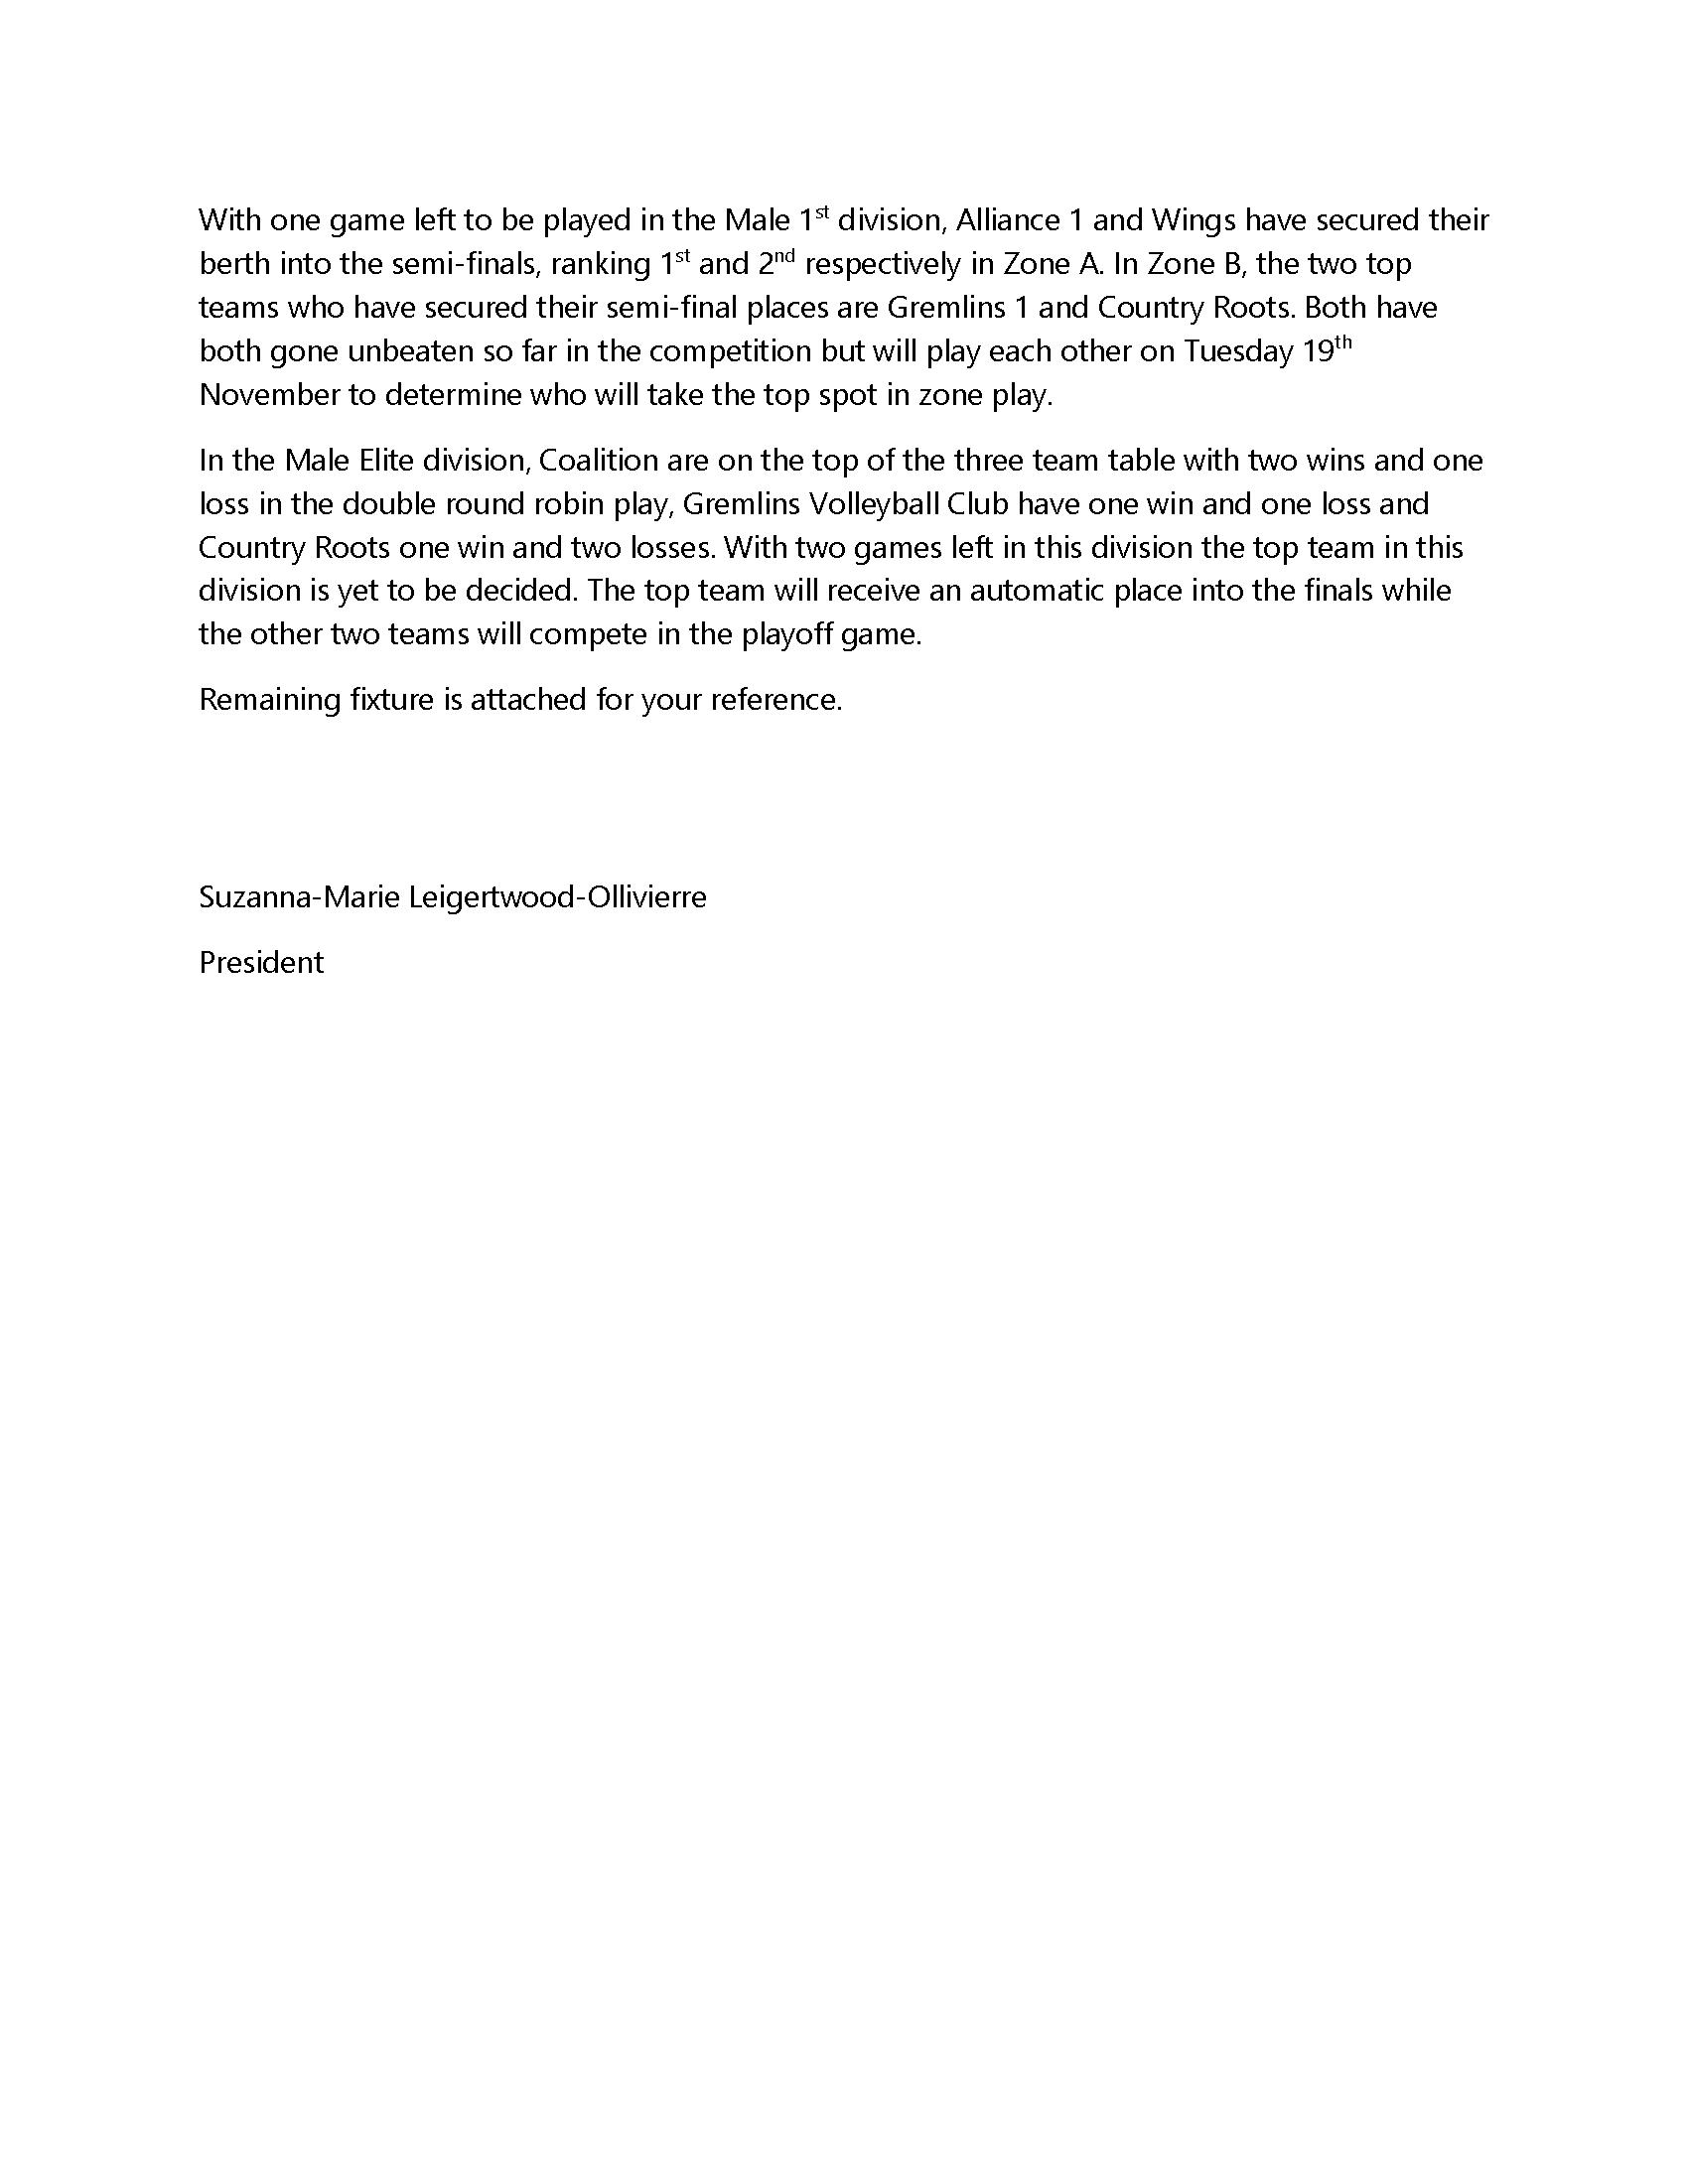 2019 Nov 17 Press Release SVGVA Championships_Page_2